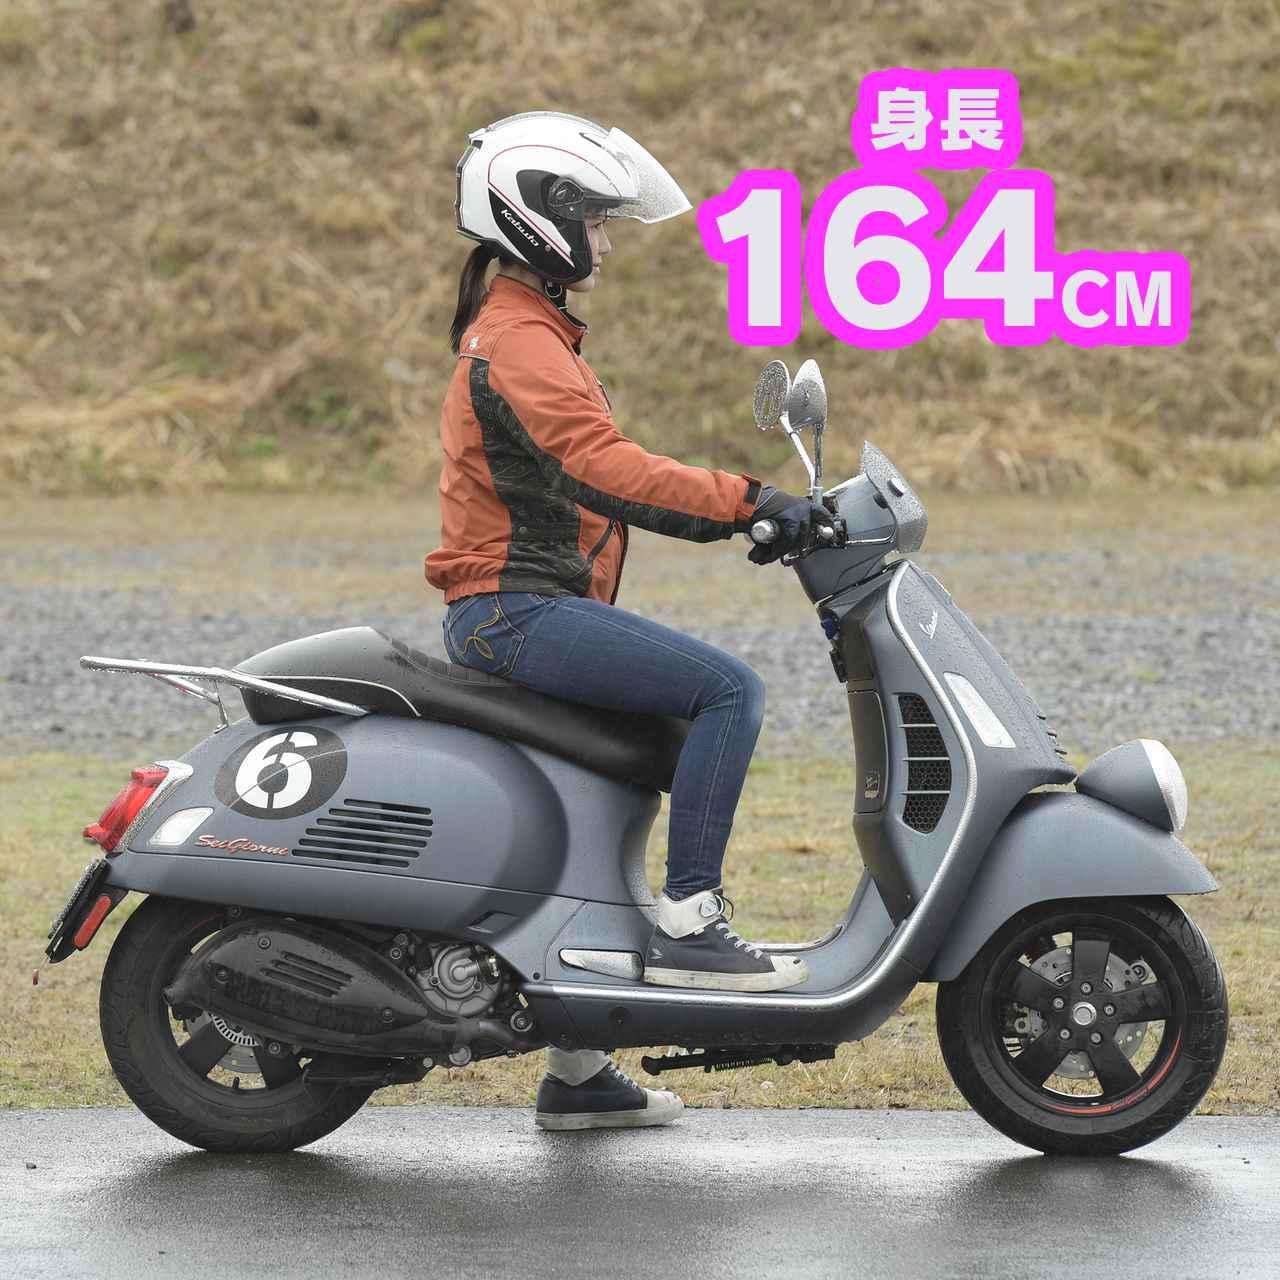 Images : 3番目の画像 - 身長別/ライポジ&足つきチェック - webオートバイ